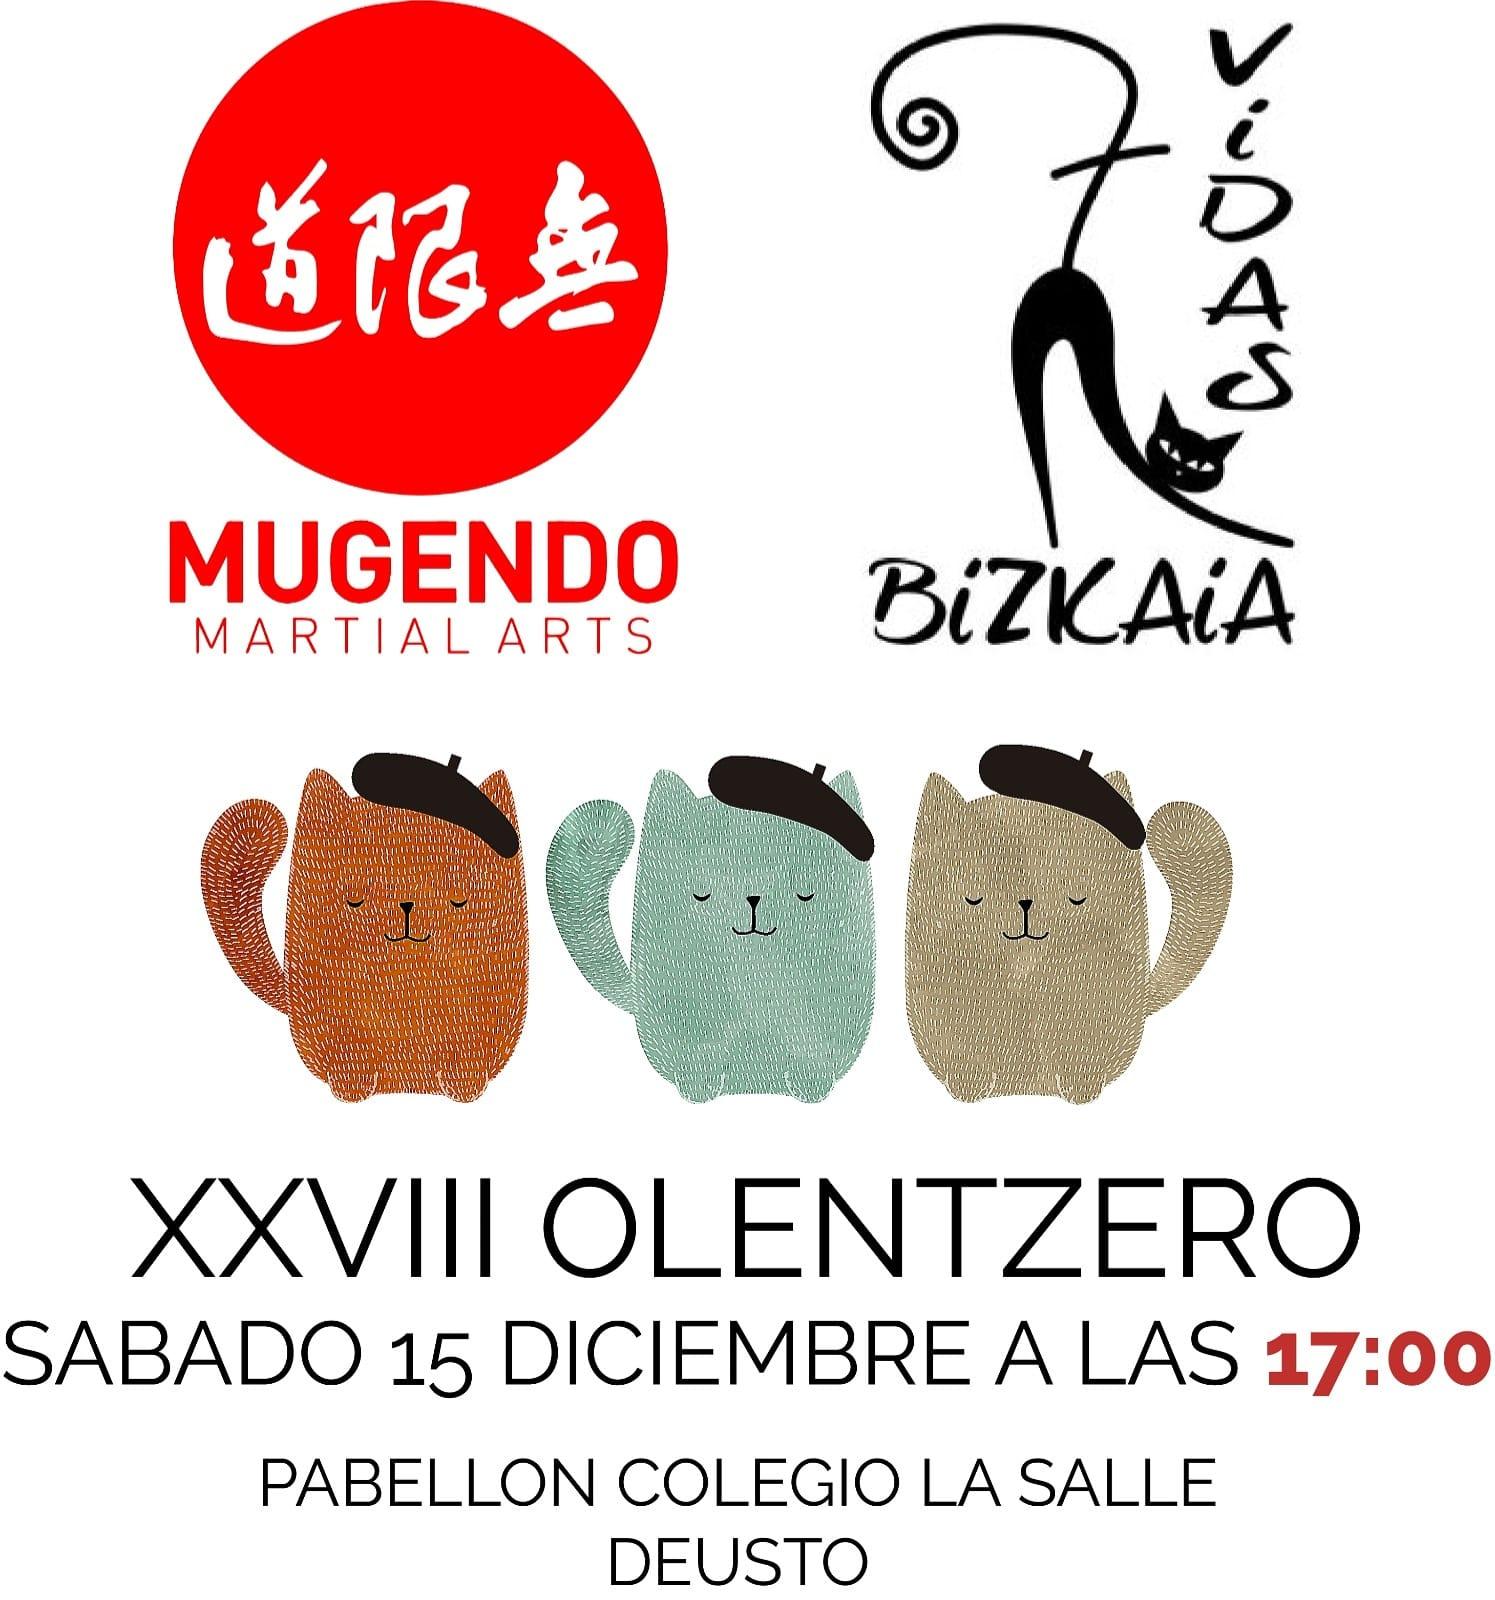 XXVIII Olentzero Mugendo